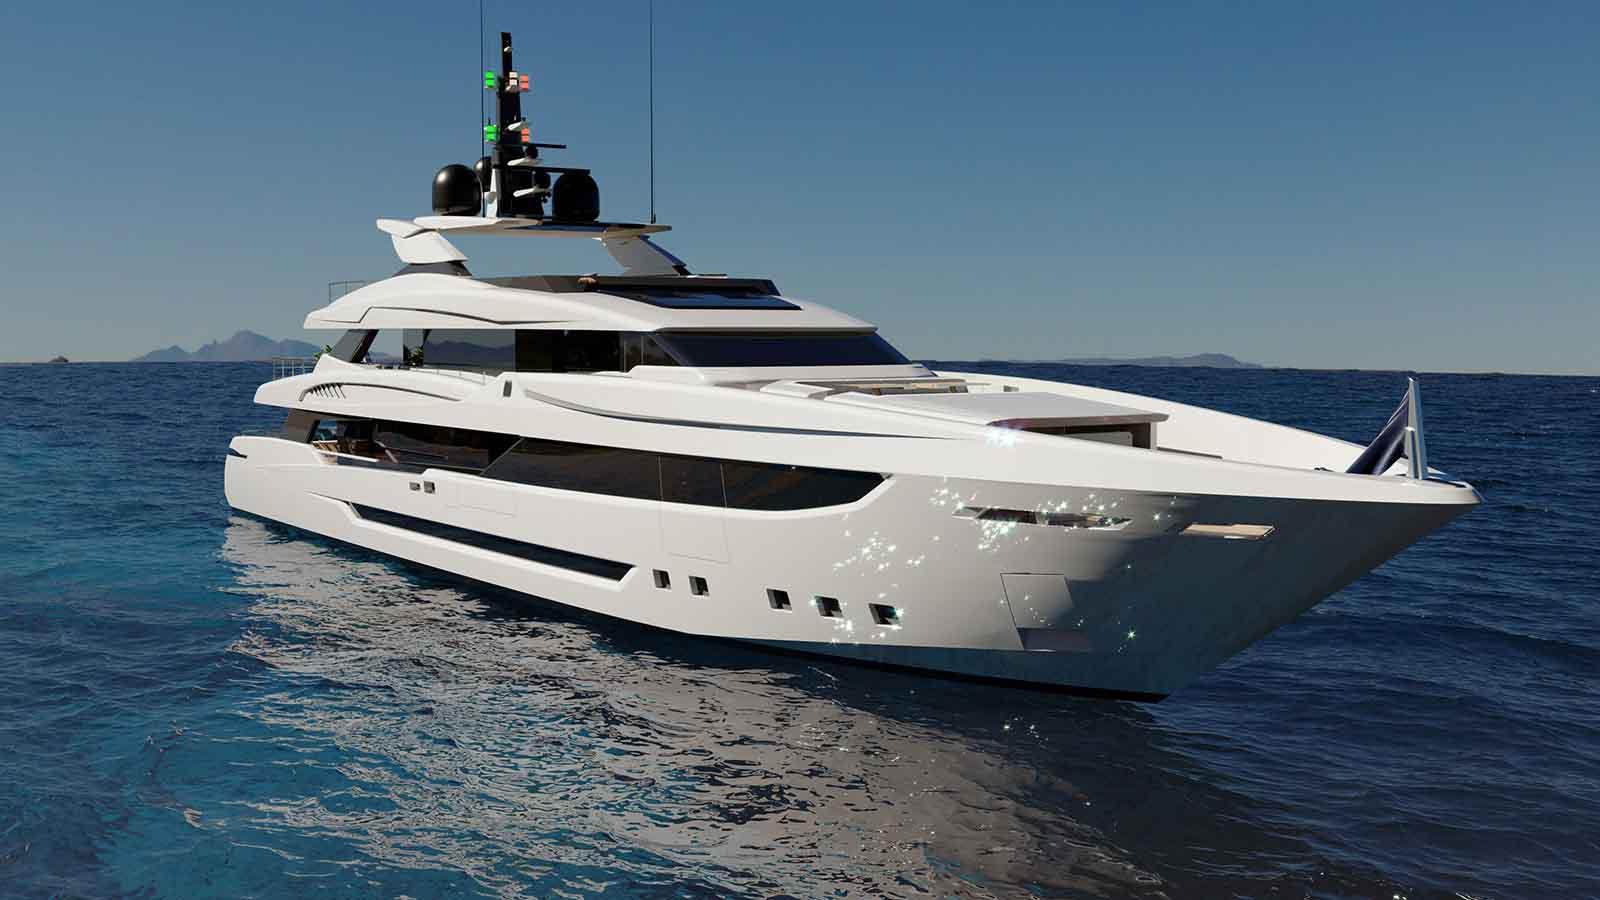 mondomarine novo superiate alumínio - boat shopping